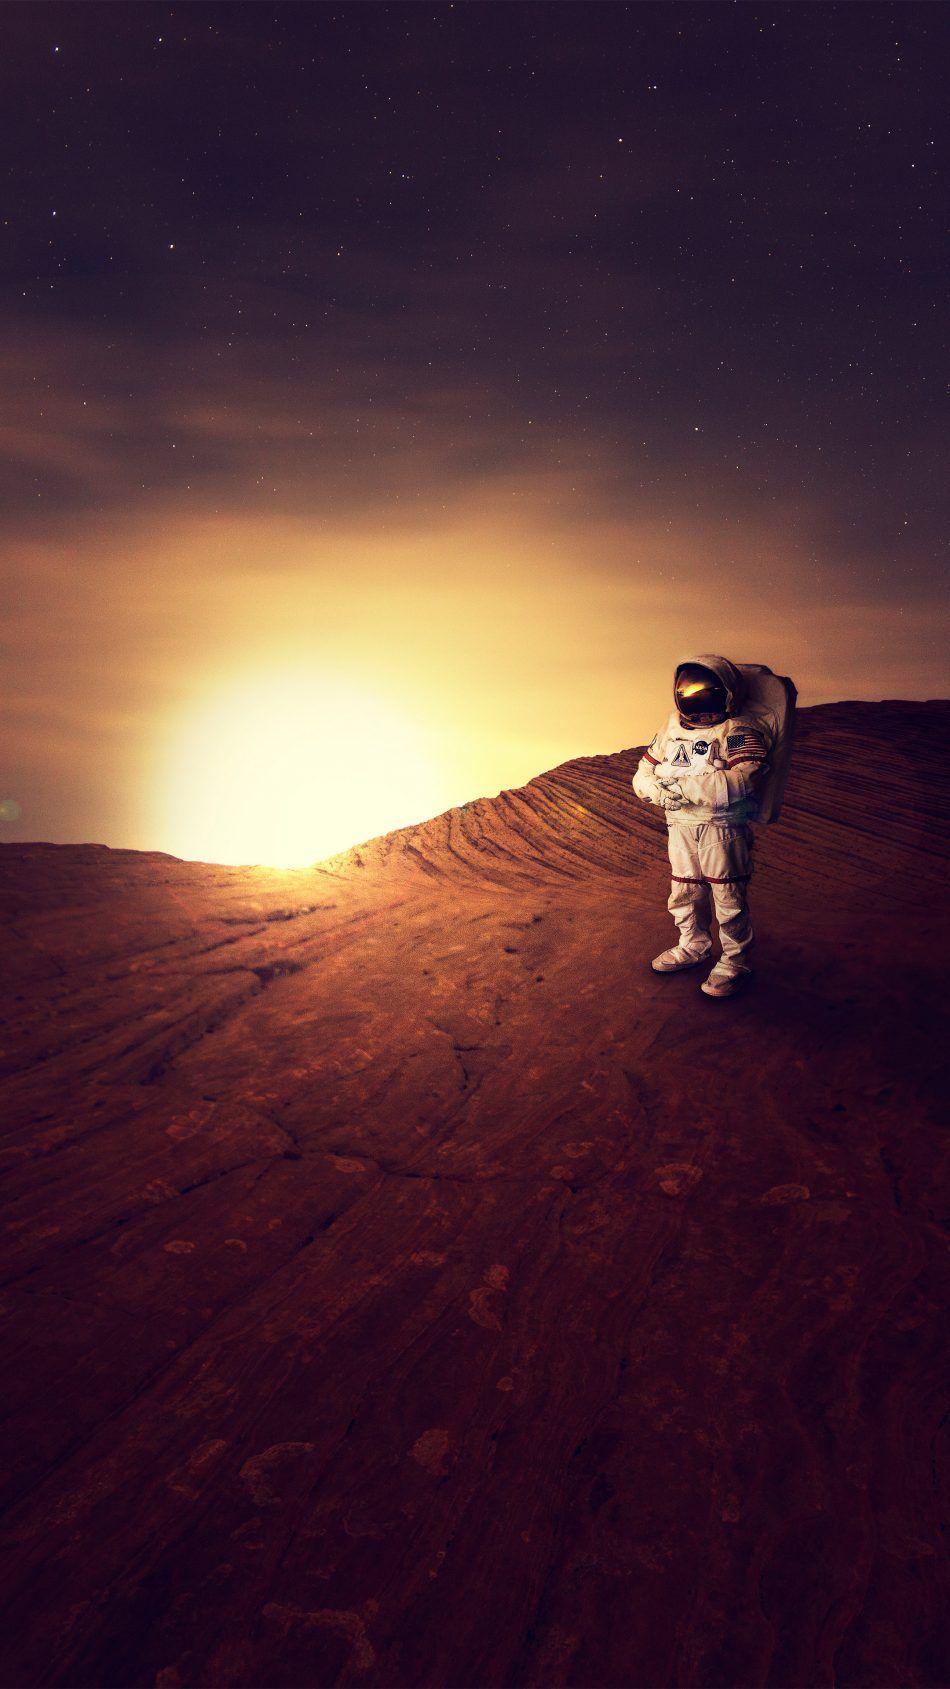 Astronaut On Planet Mars Sunset 4k Ultra Hd Mobile Wallpaper Astronaut Wallpaper Iphone Wallpaper Moon Wallpaper Iphone Neon